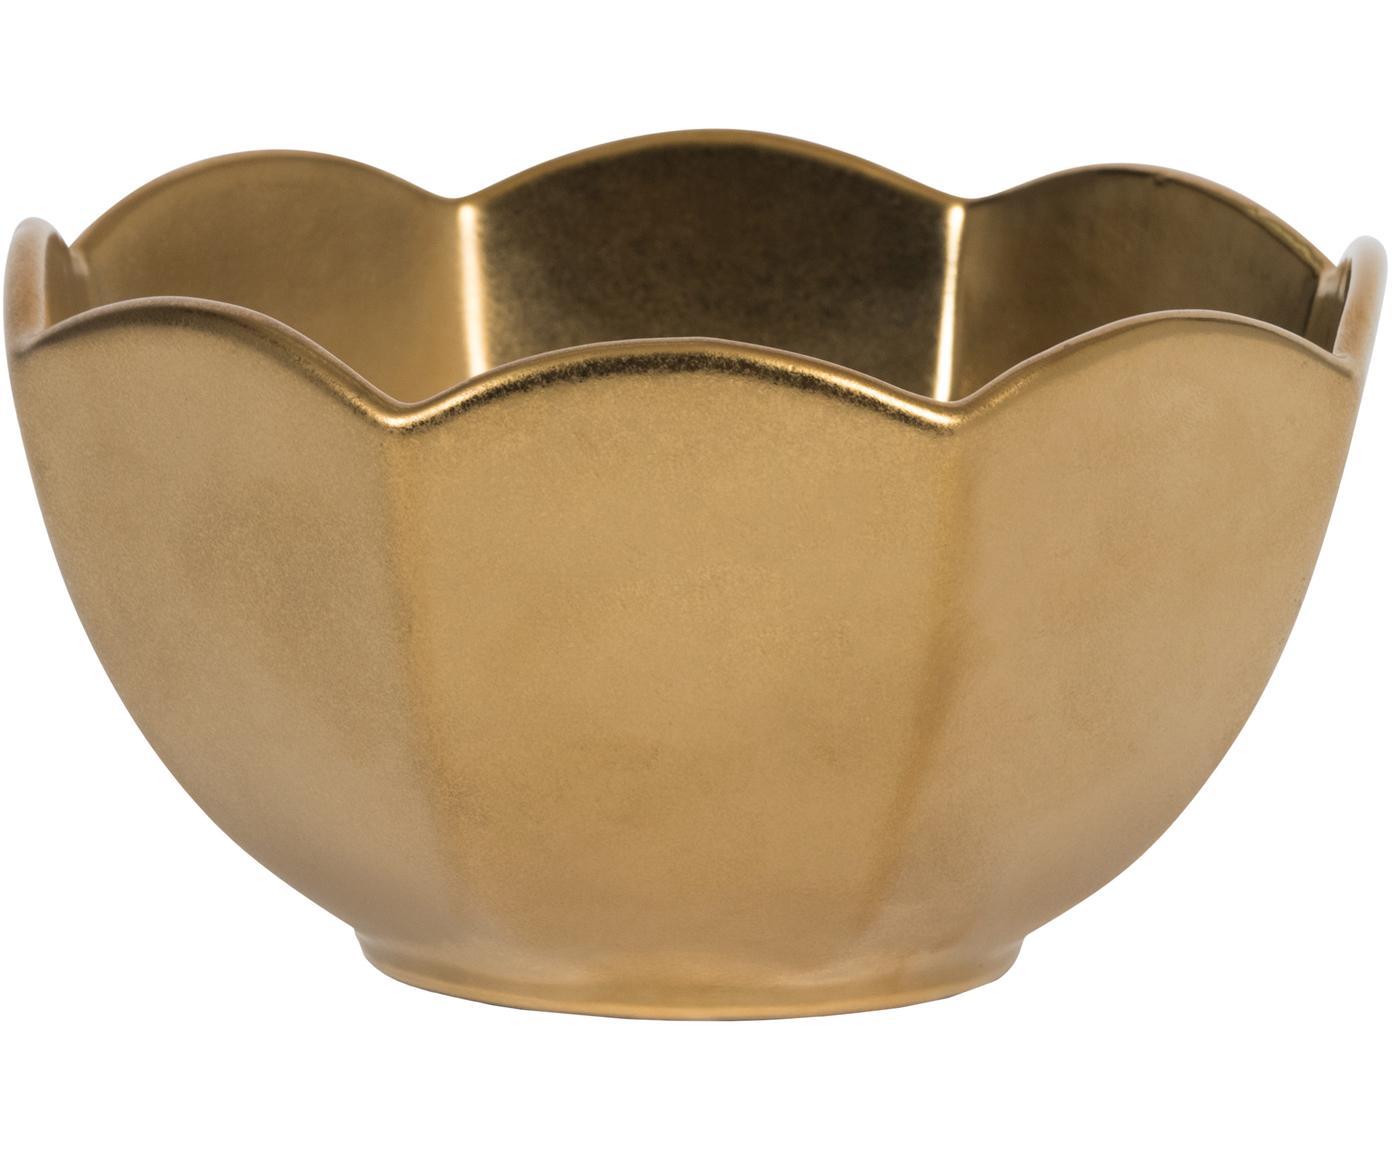 Handgemaakte schaal Ghabi in mat goudkleur, Keramiek, Goudkleurig, Ø 13 cm